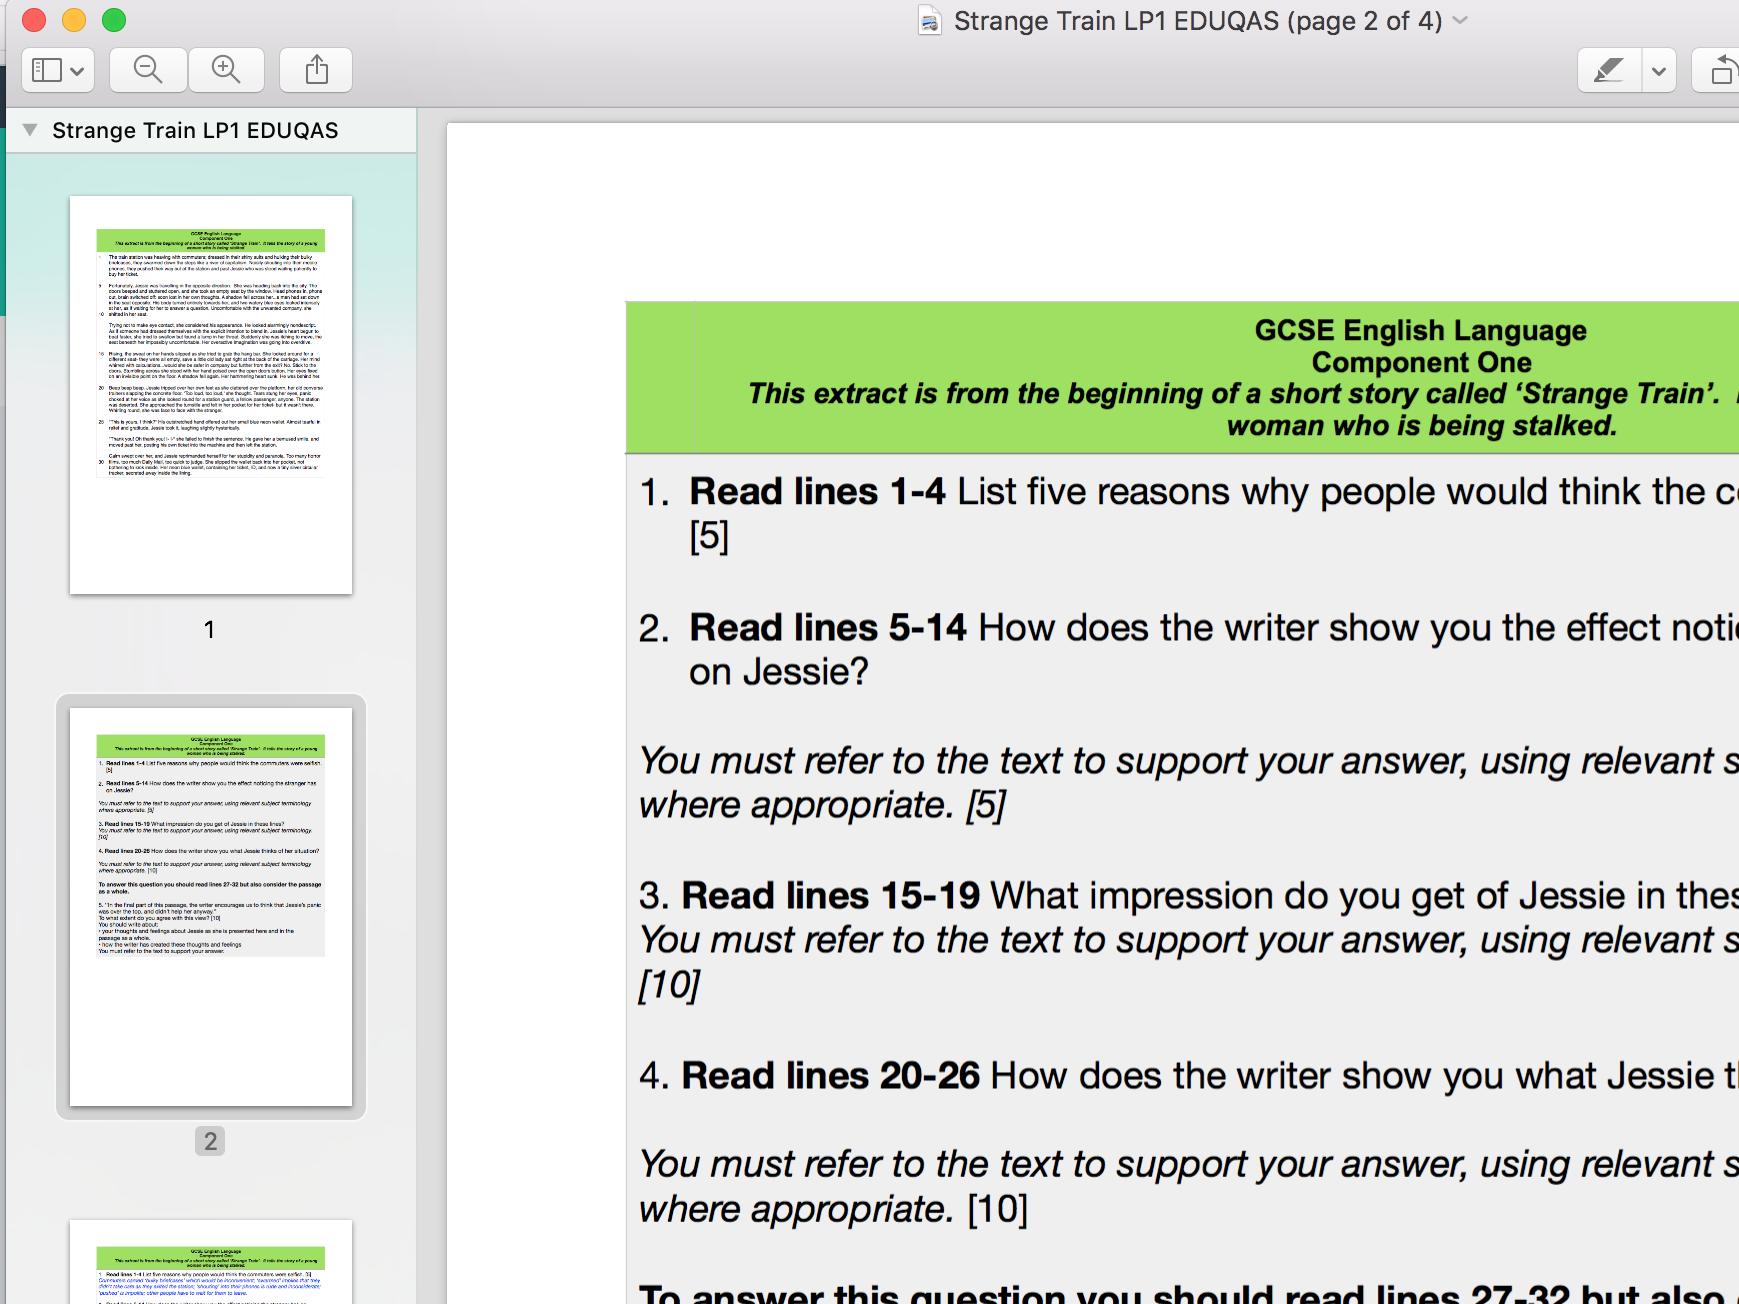 FIVE EDUQAS style Language component one mocks INC indicative content